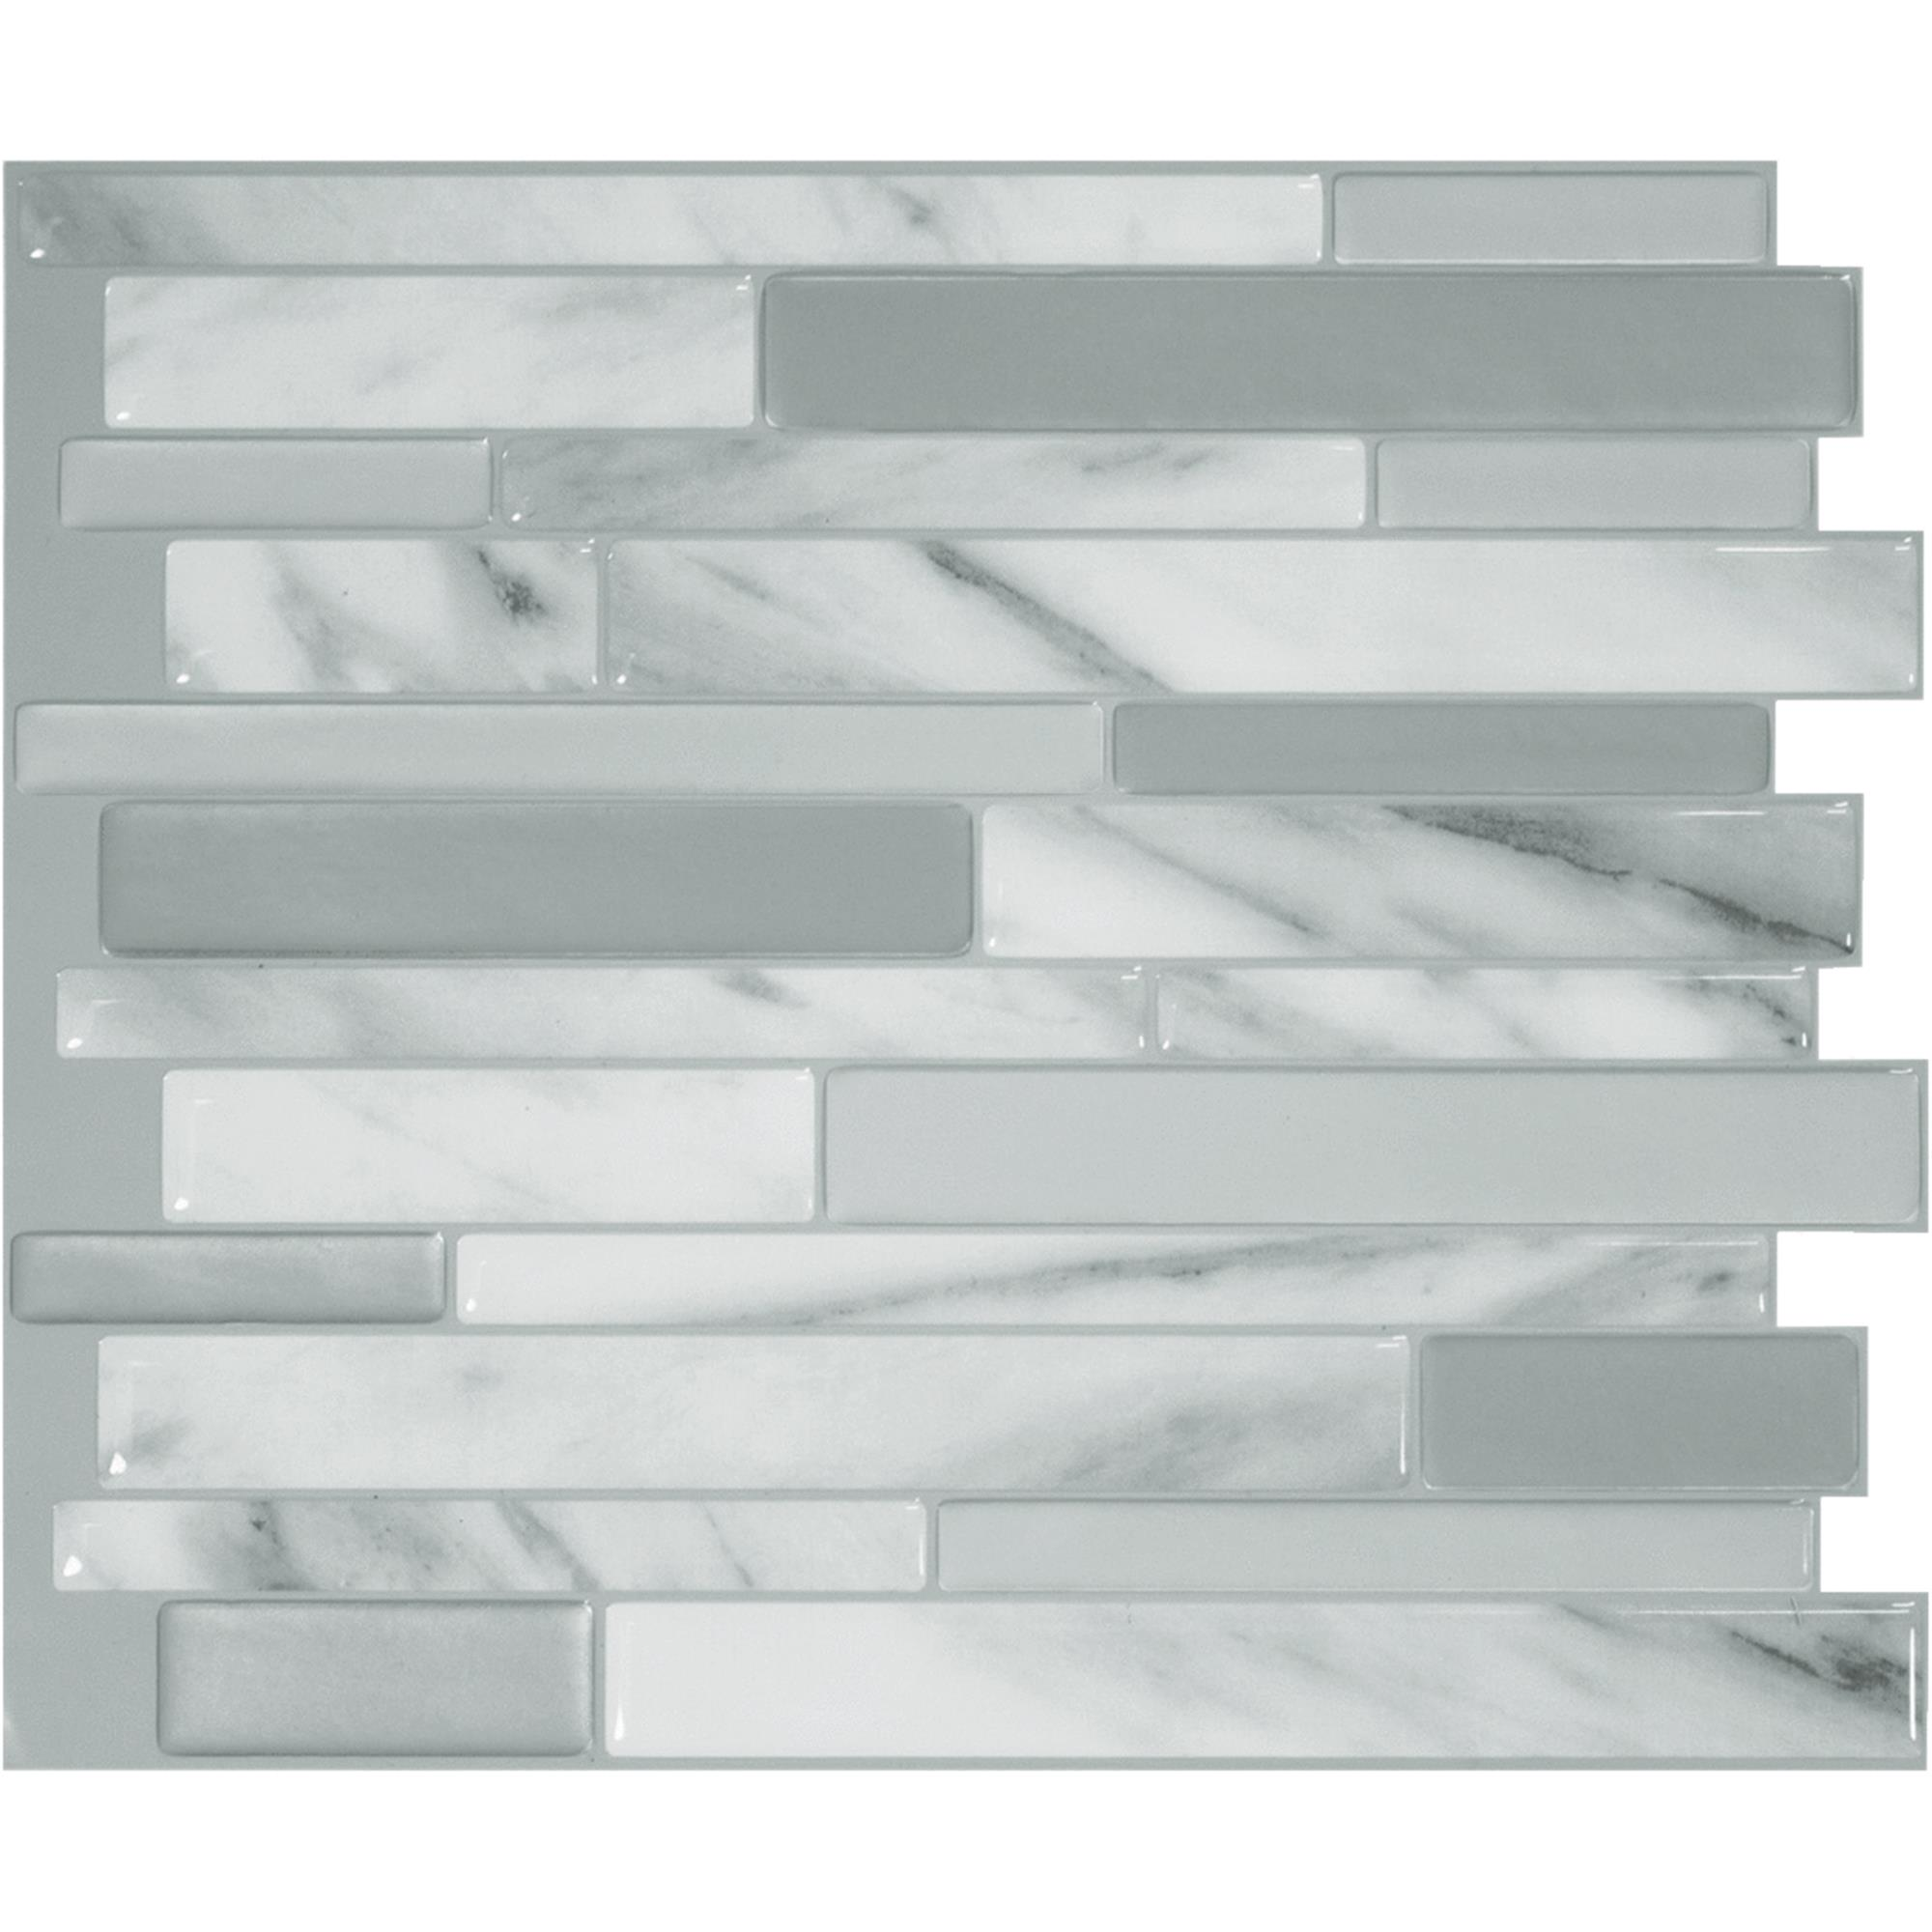 Smart Tiles Original Peel & Stick Backsplash